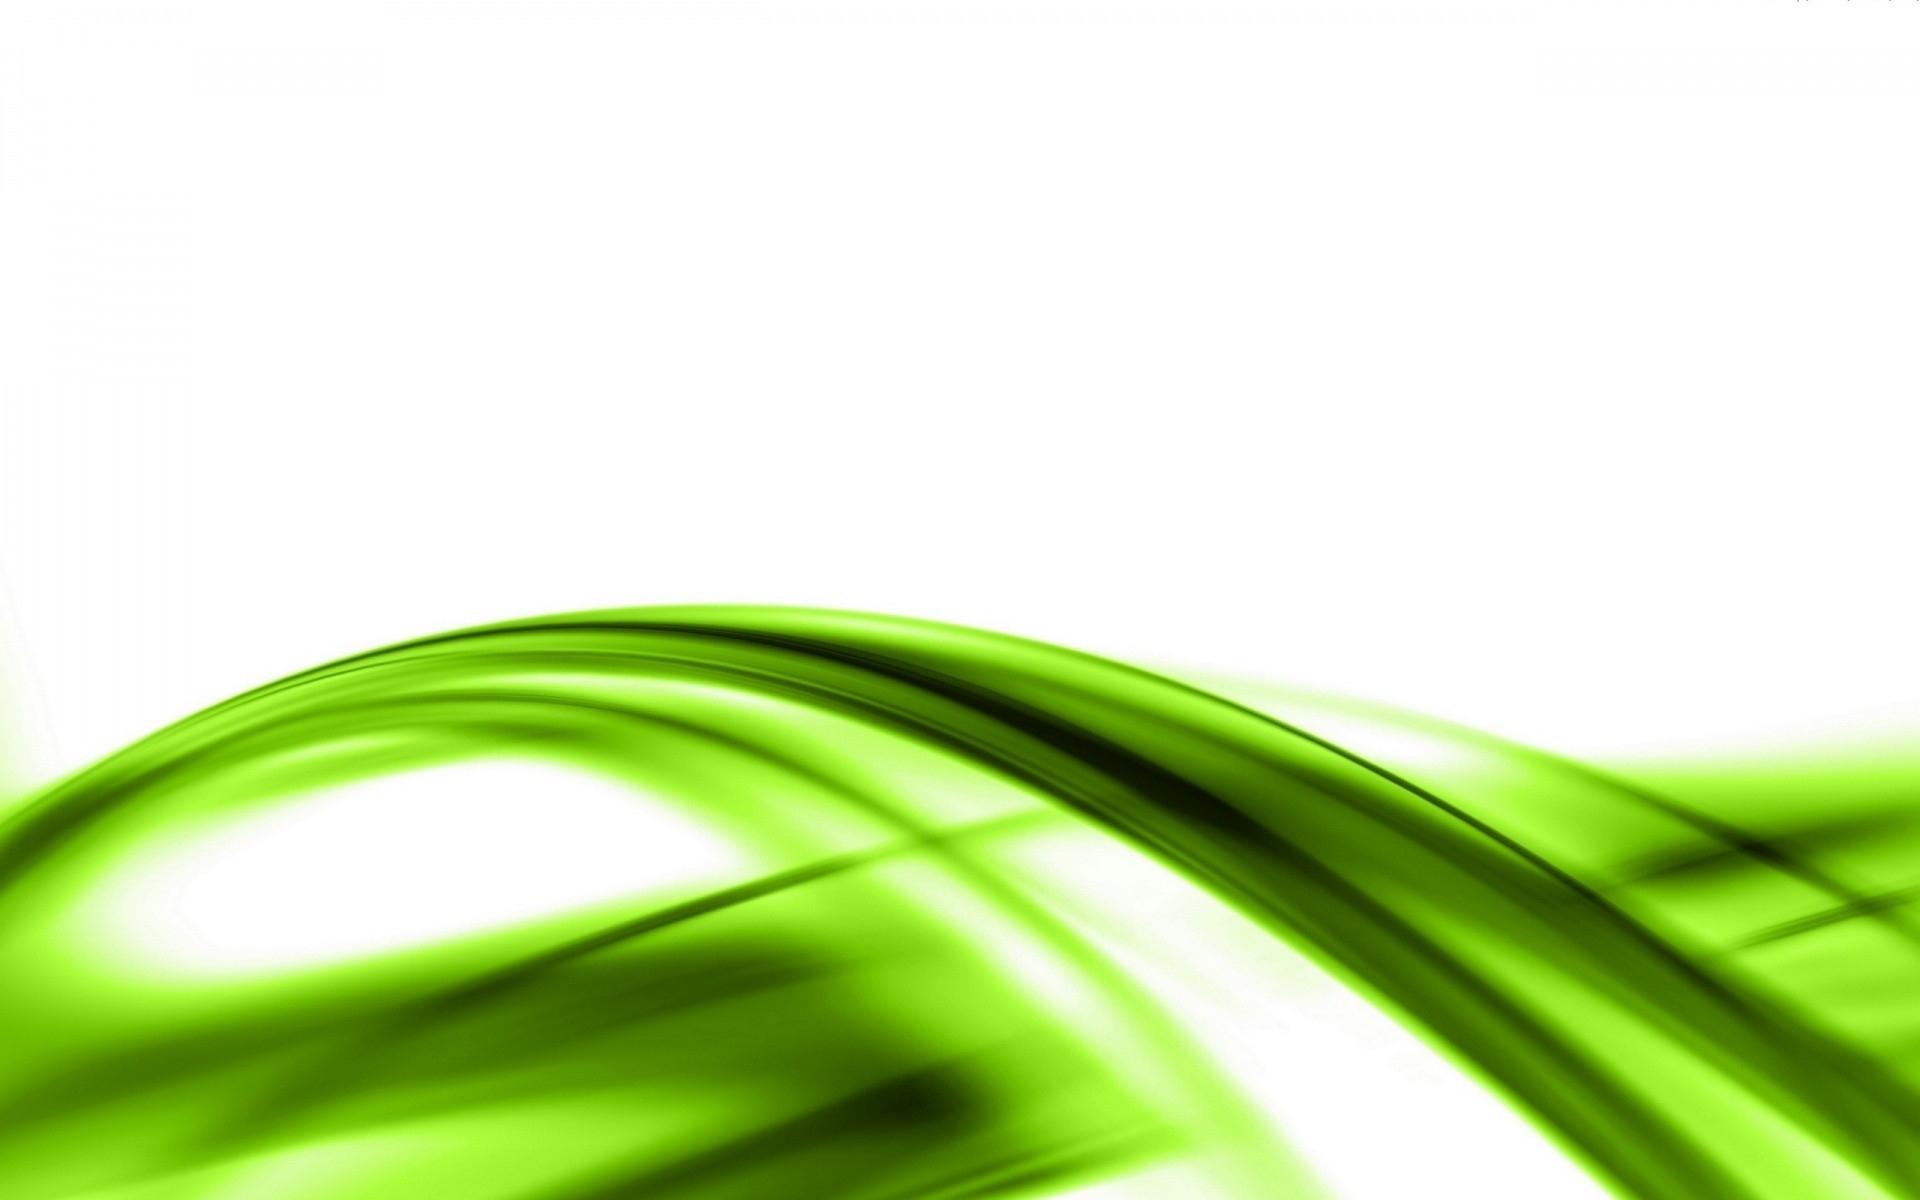 [41+] Green and White Wallpaper on WallpaperSafari